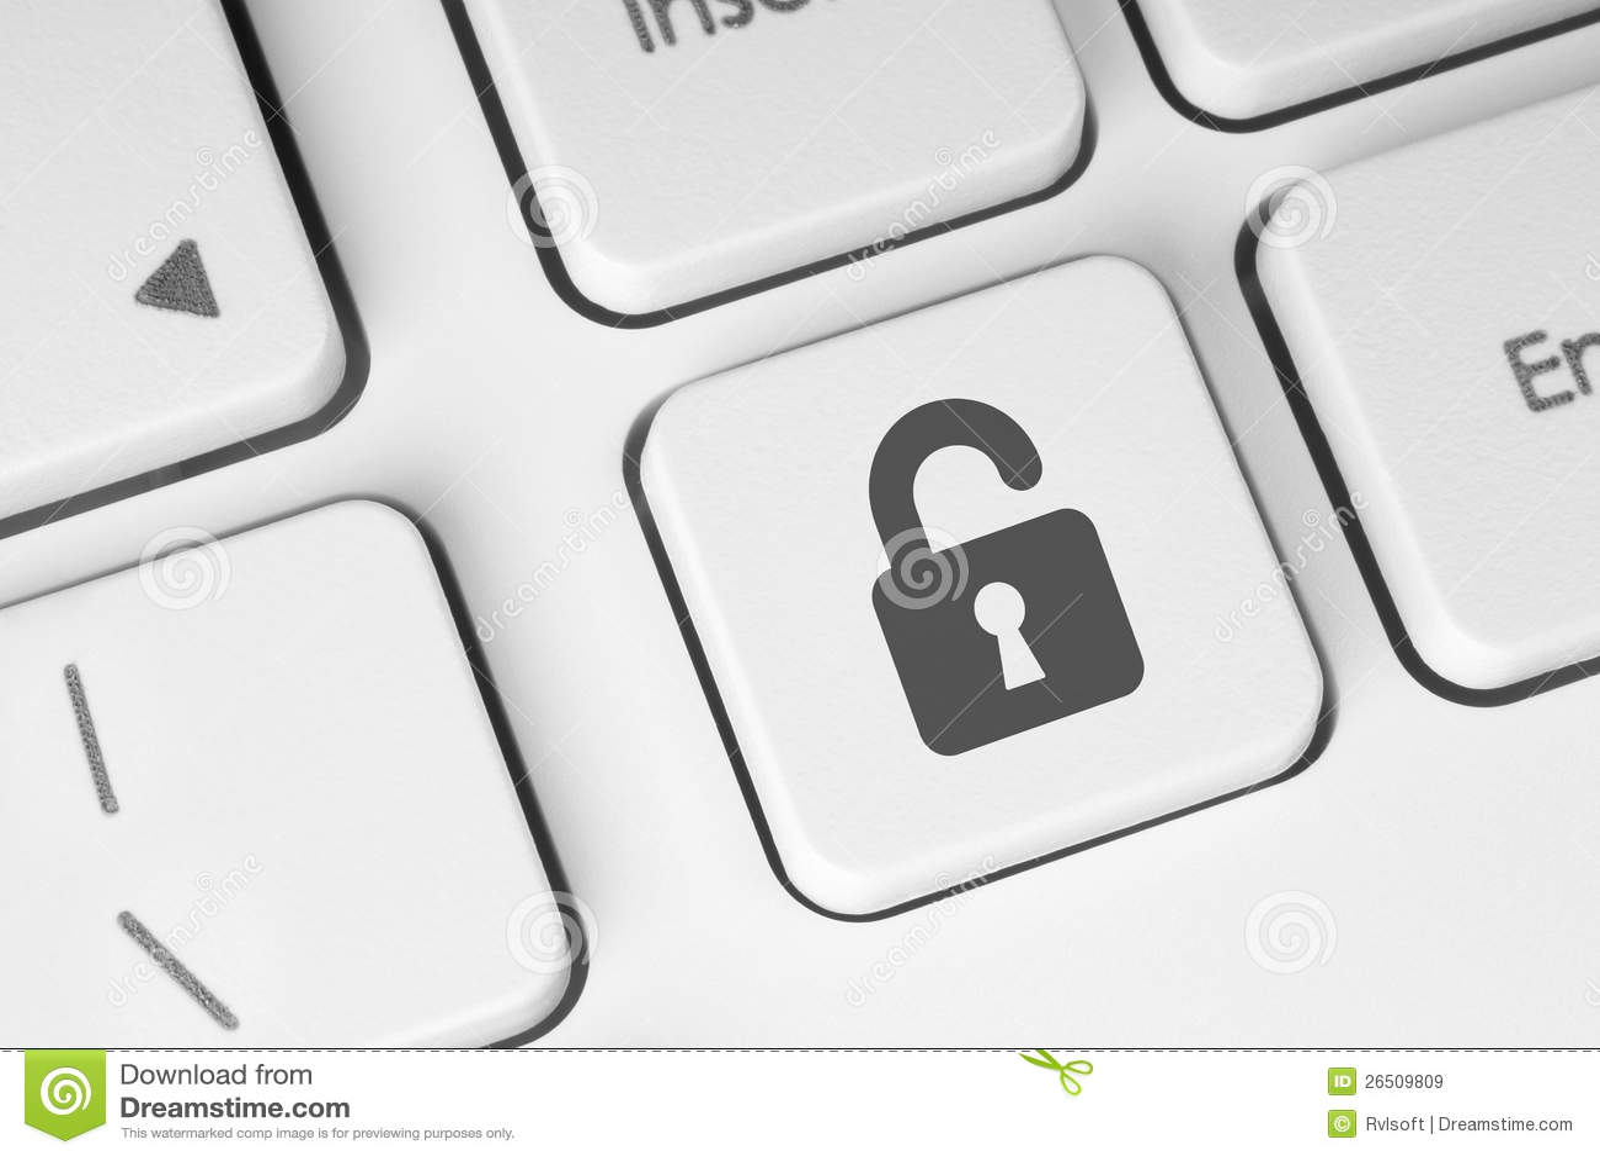 Tecla de fechamento aberto no teclado